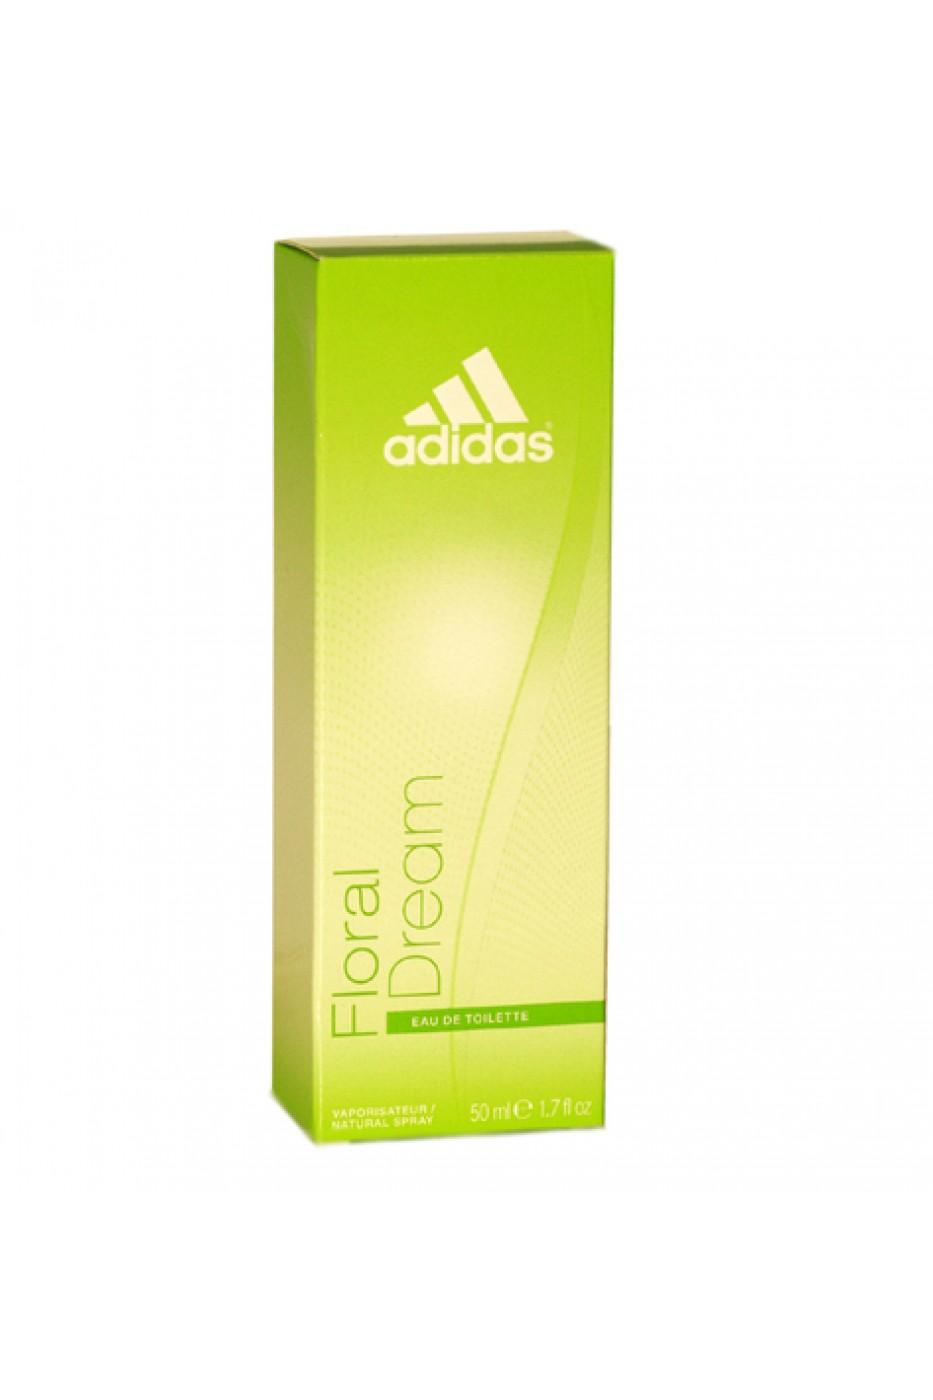 Adidas Floral Dream аромат для женщин